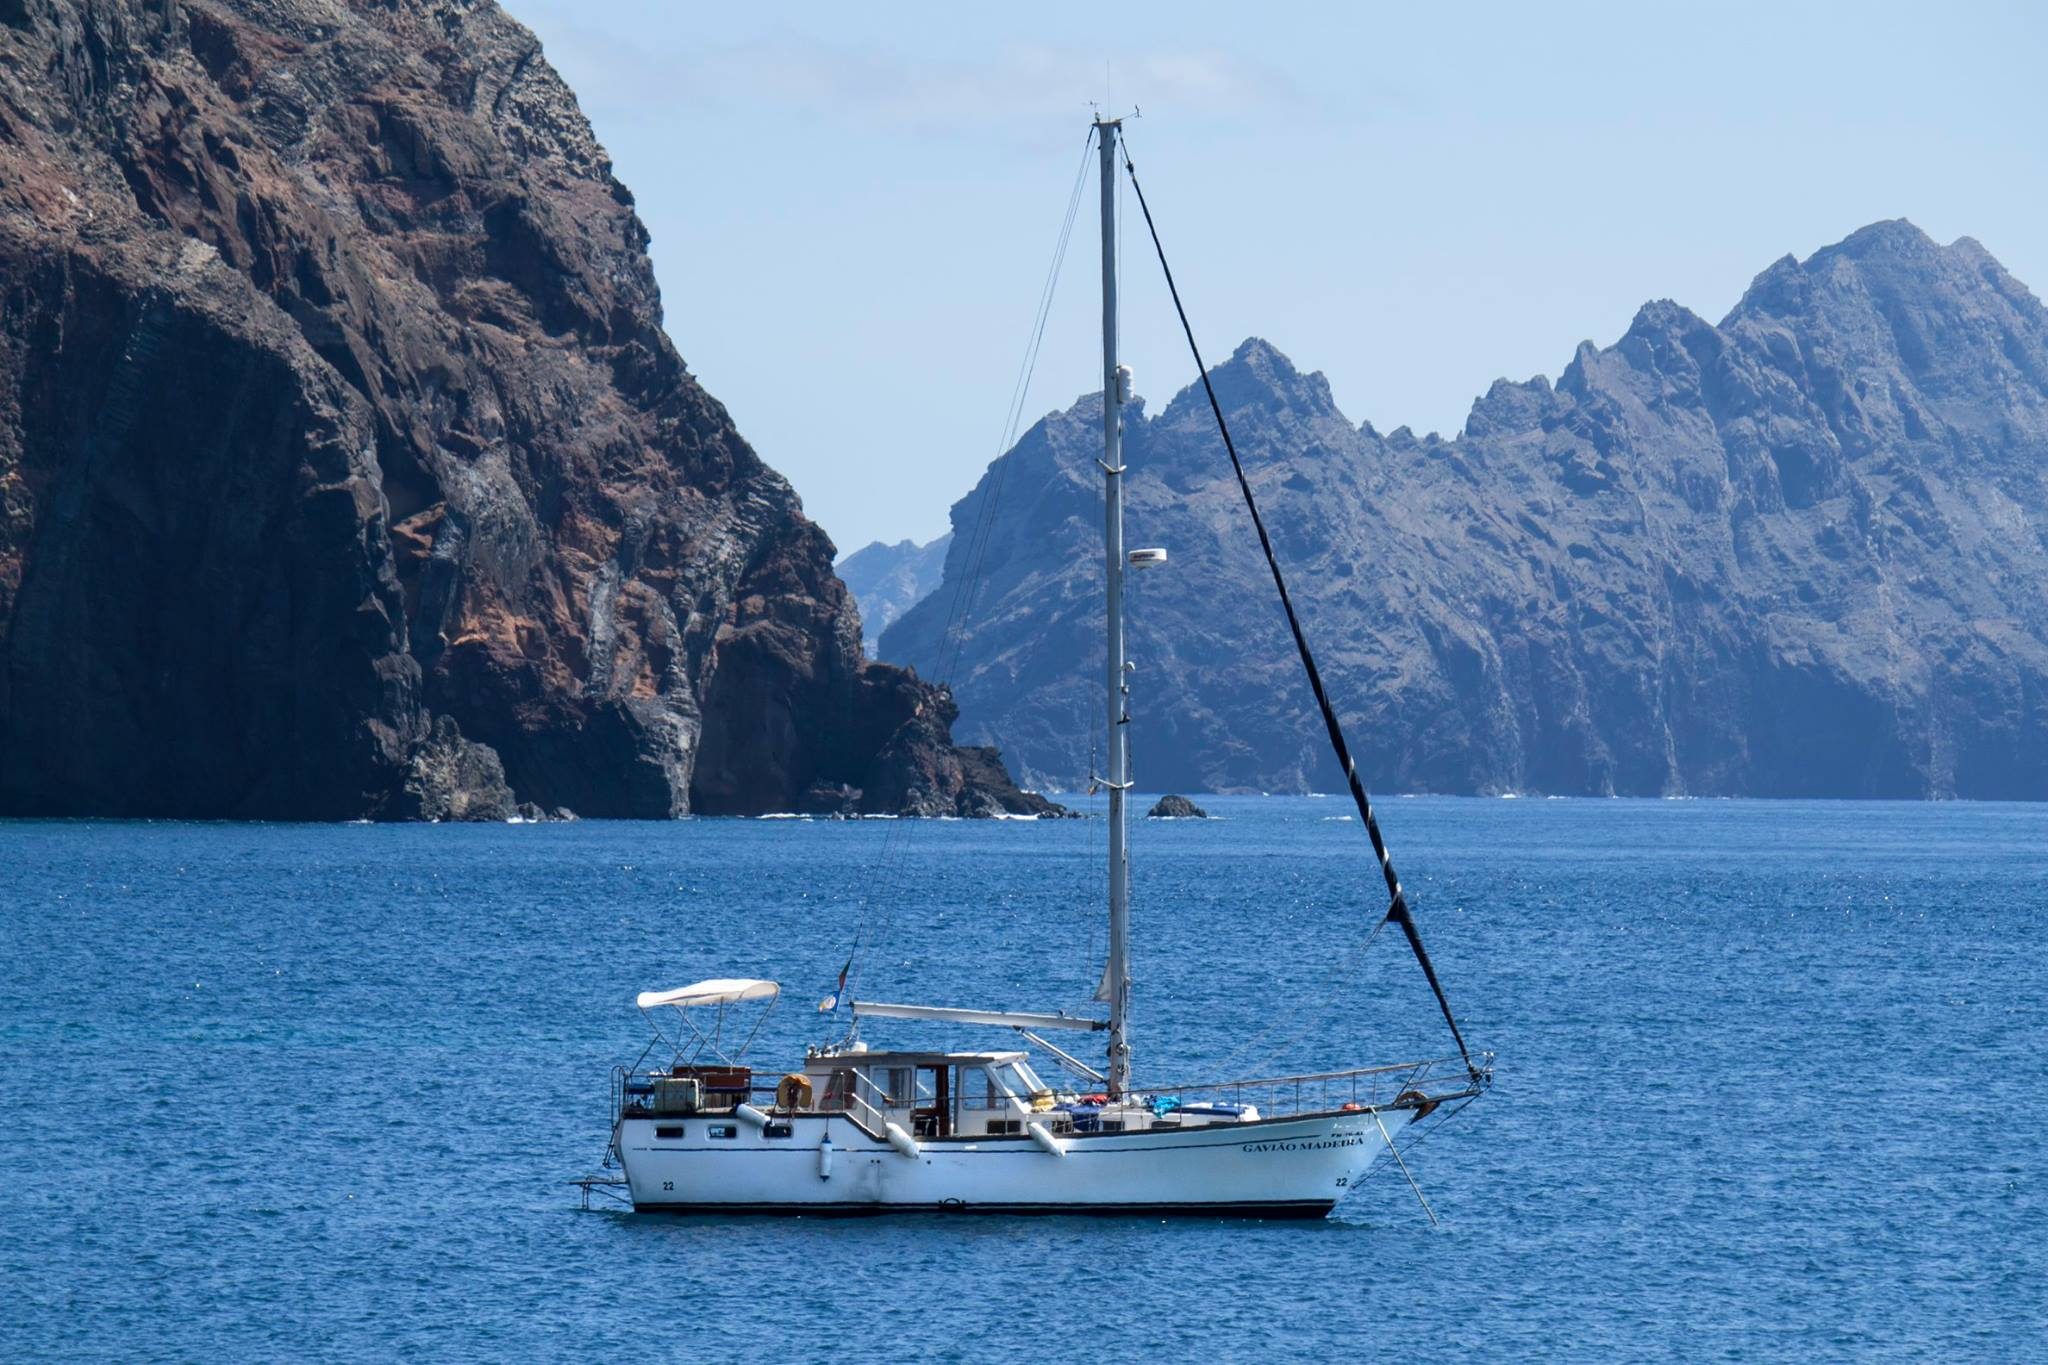 Gavião Sailing Boat